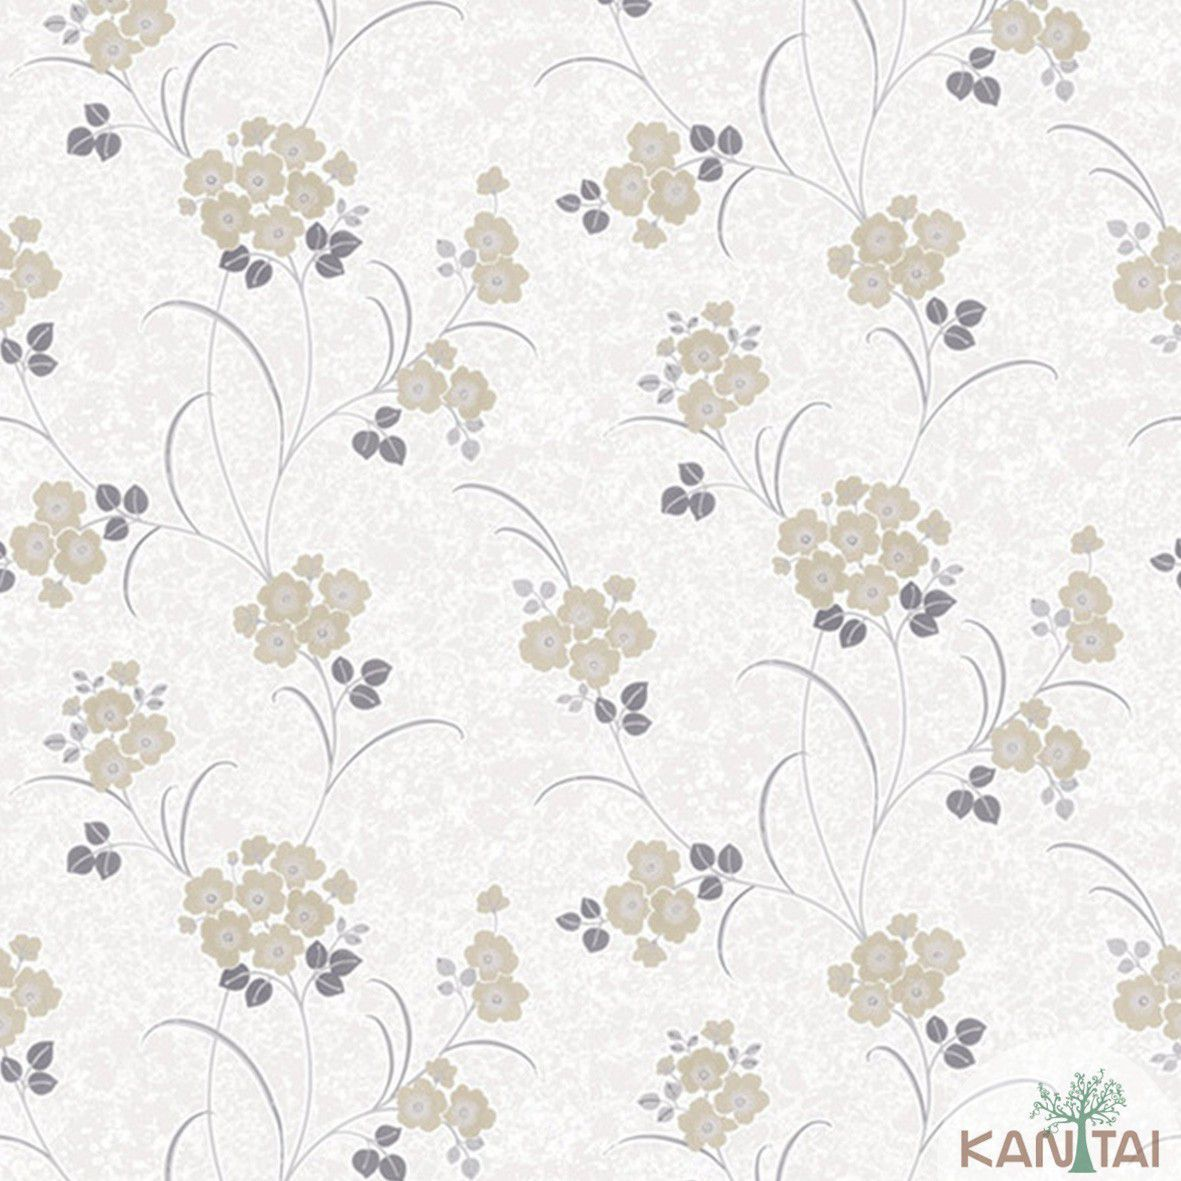 Papel de Parede   Kan Tai Vinilico Coleção Style Floral Creme, Marrom, Cinza